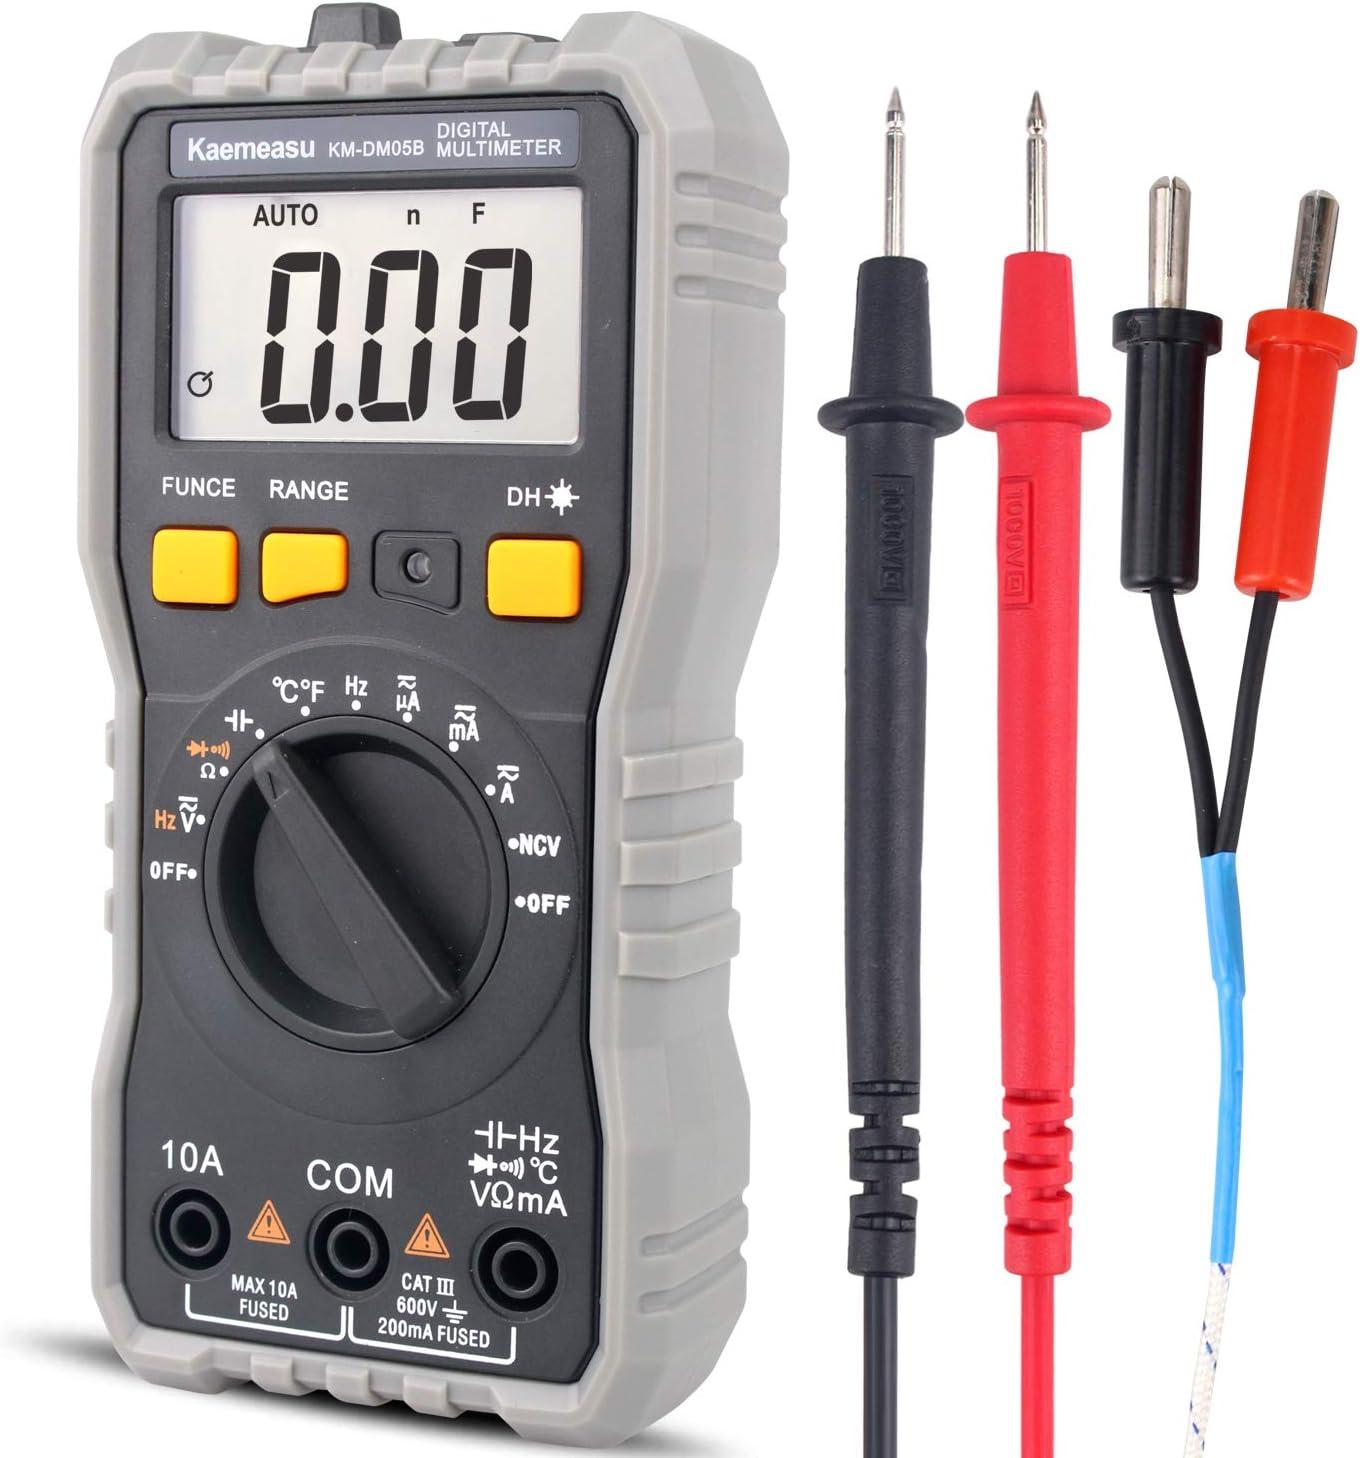 Mini Digital Multimeter DC/AC Resistance Capacitance High Precision Electrician Universal Meter Repair Tool With Temperature KM-DM05B